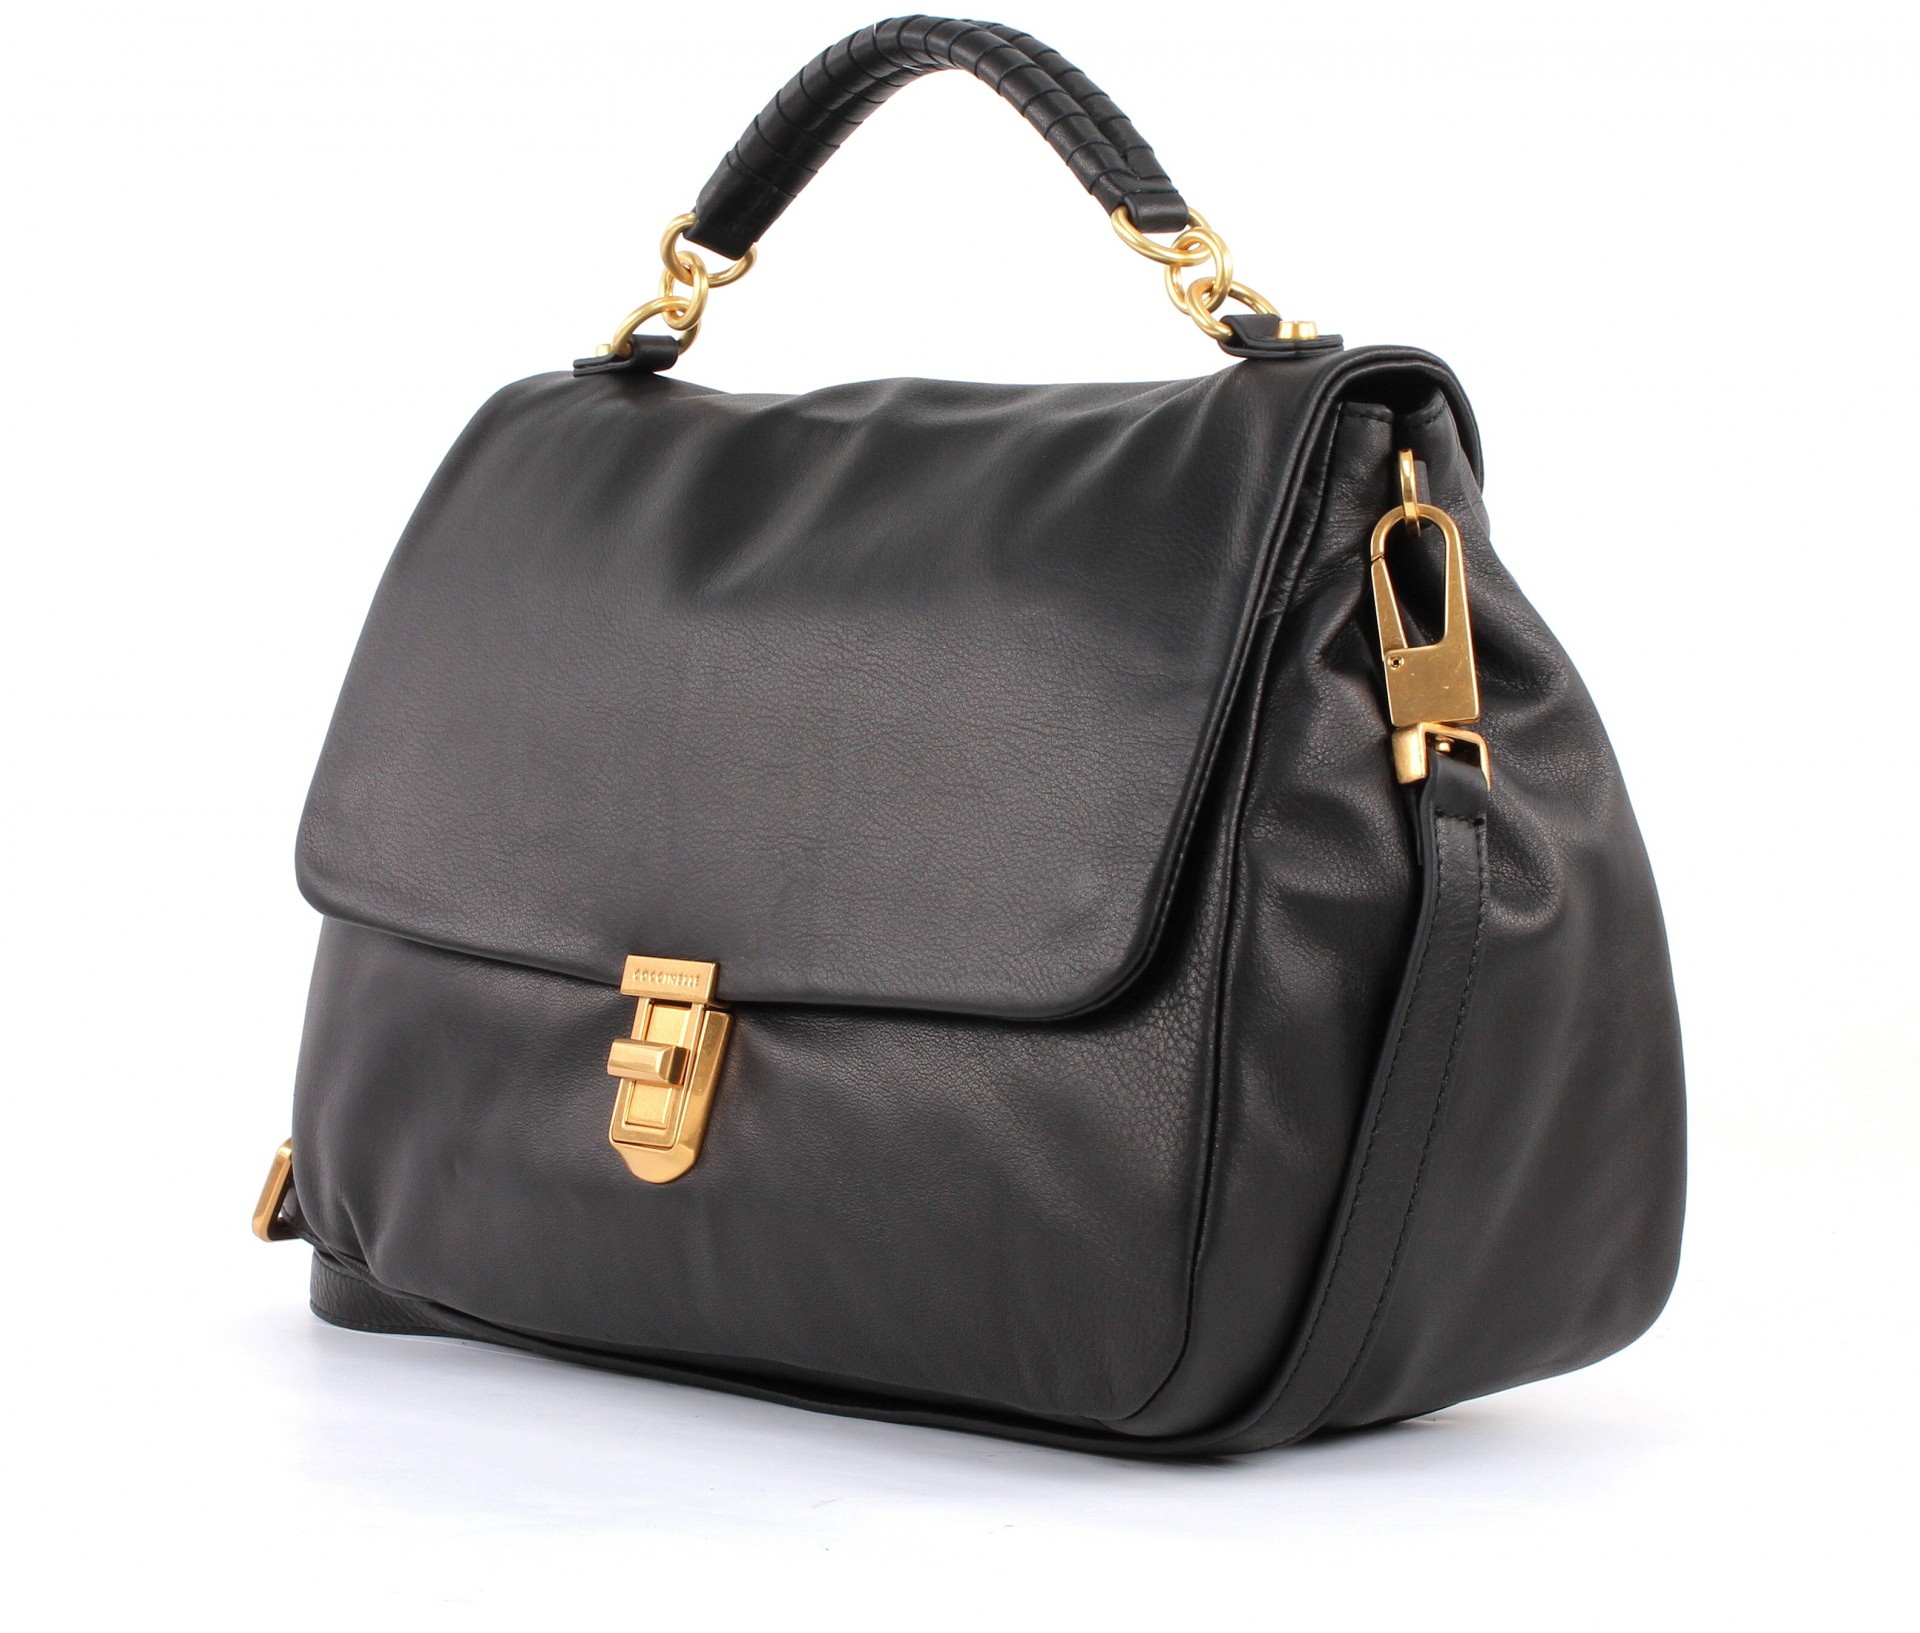 coccinelle oscar lux shoulderbag tasche umh ngetasche handtasche damen schwarz. Black Bedroom Furniture Sets. Home Design Ideas